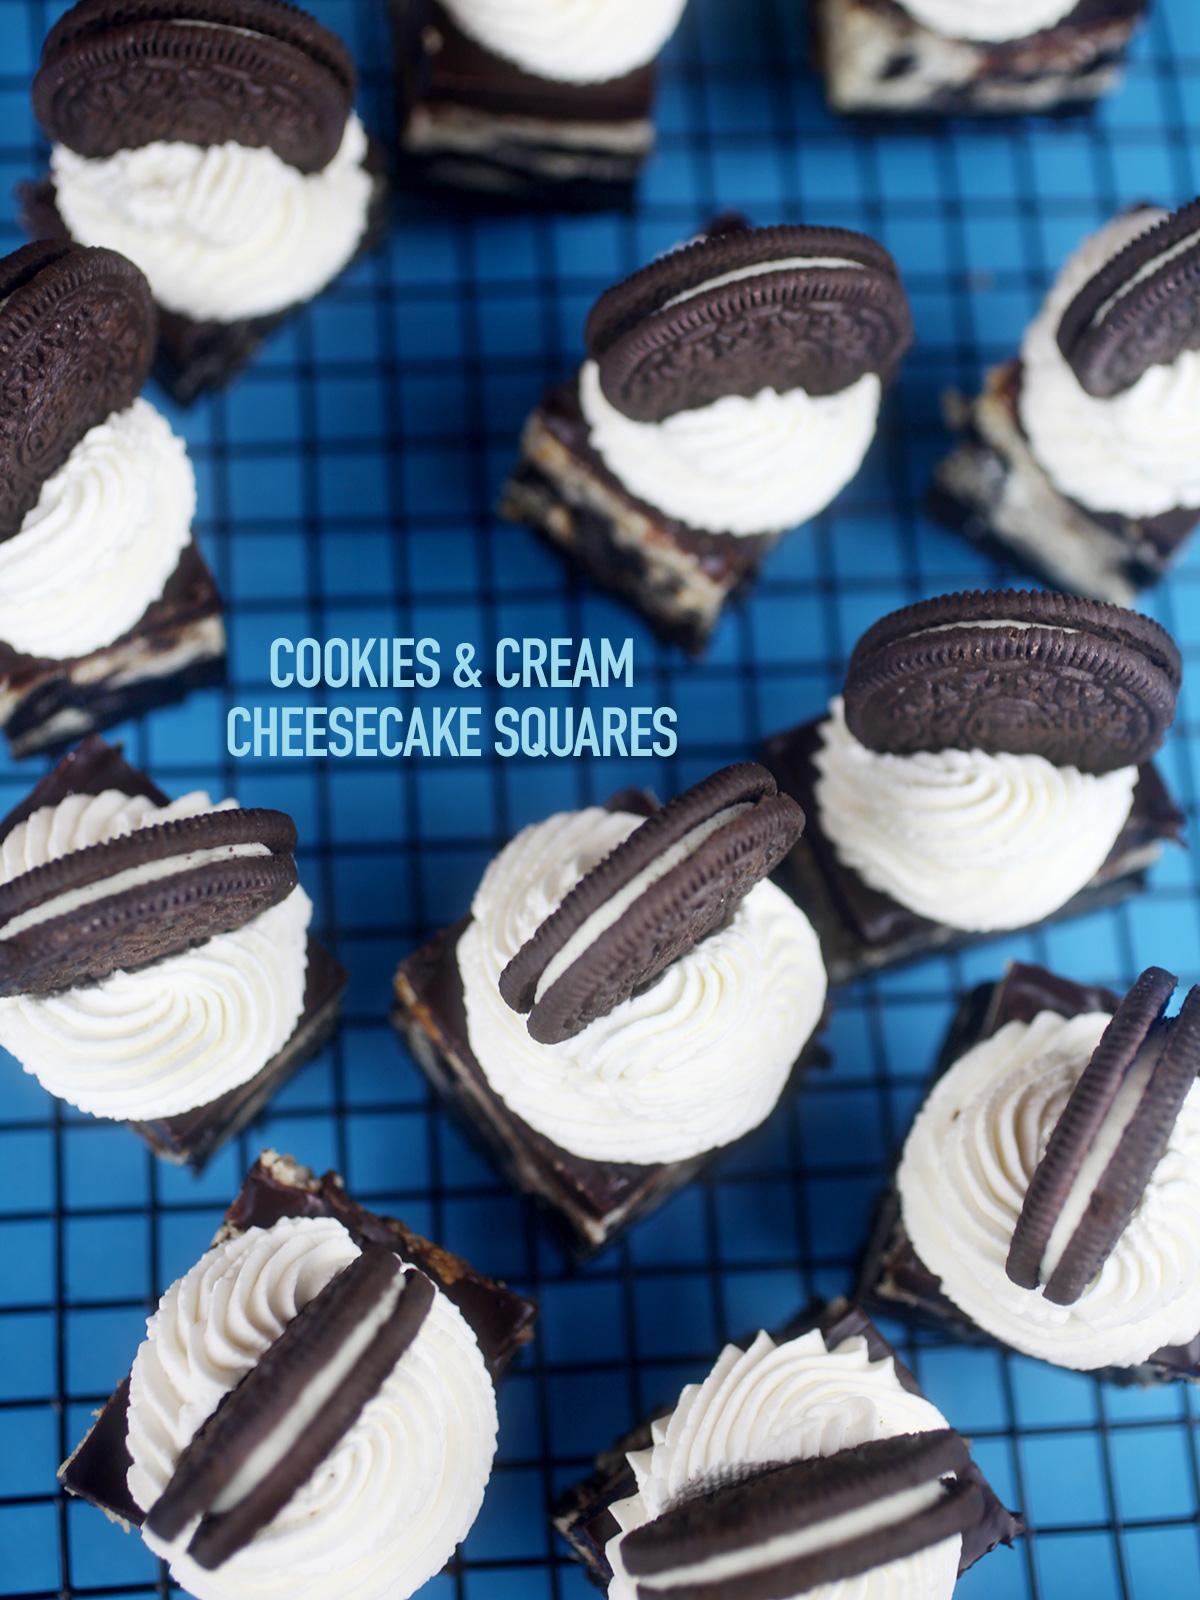 01_Bakerella_Cookies-Cream_Cheesecake_